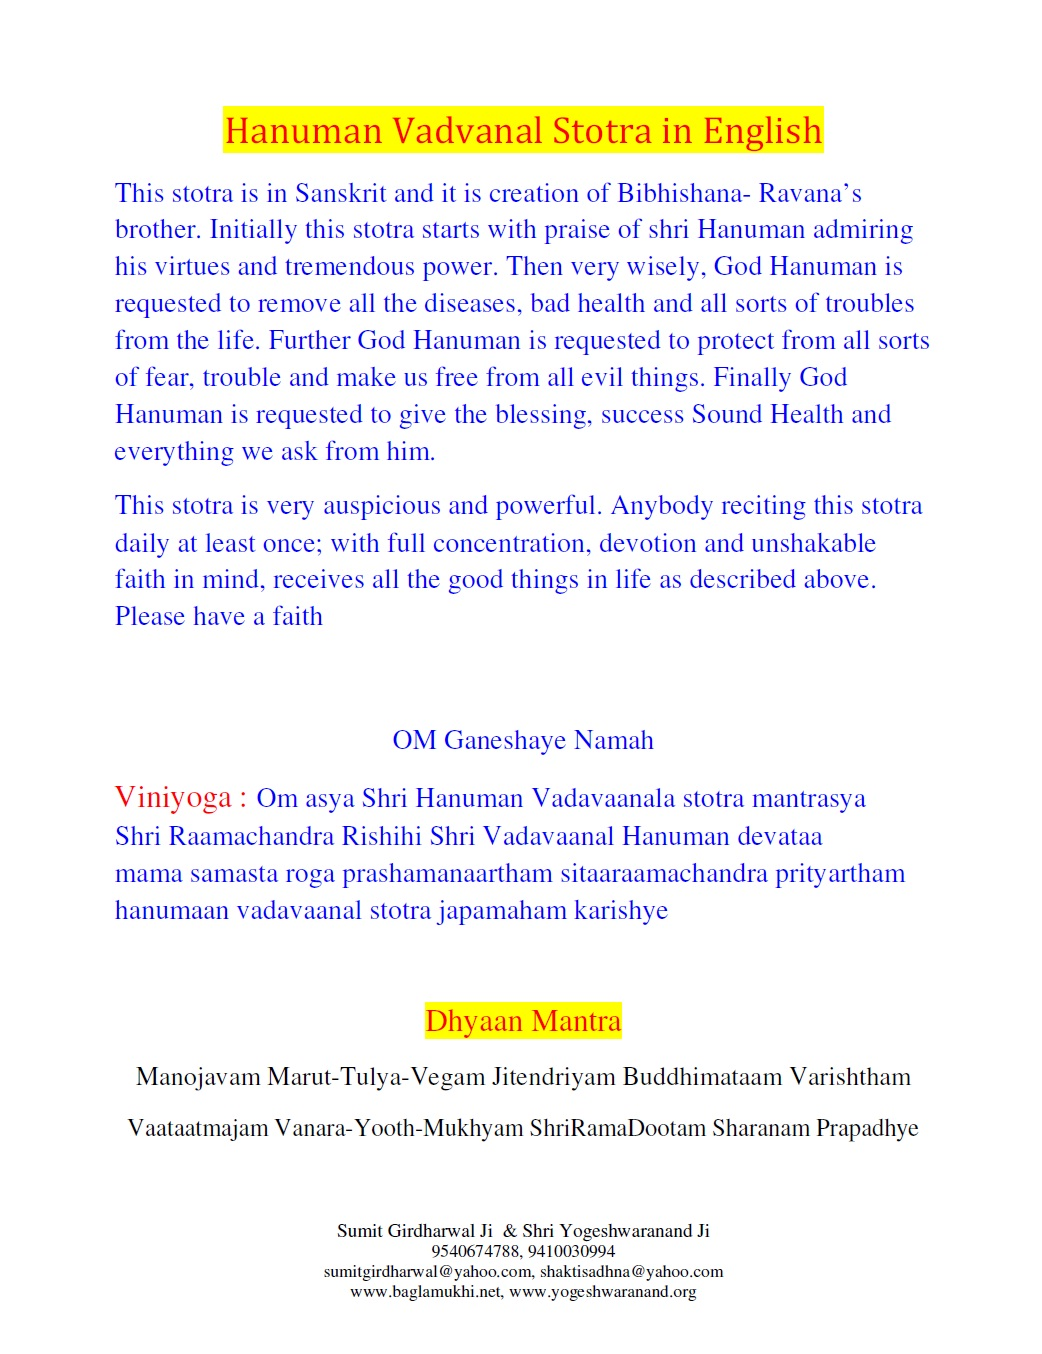 Shri Hanuman Vadvanal Stotra in Hindi, Sanskrit and English